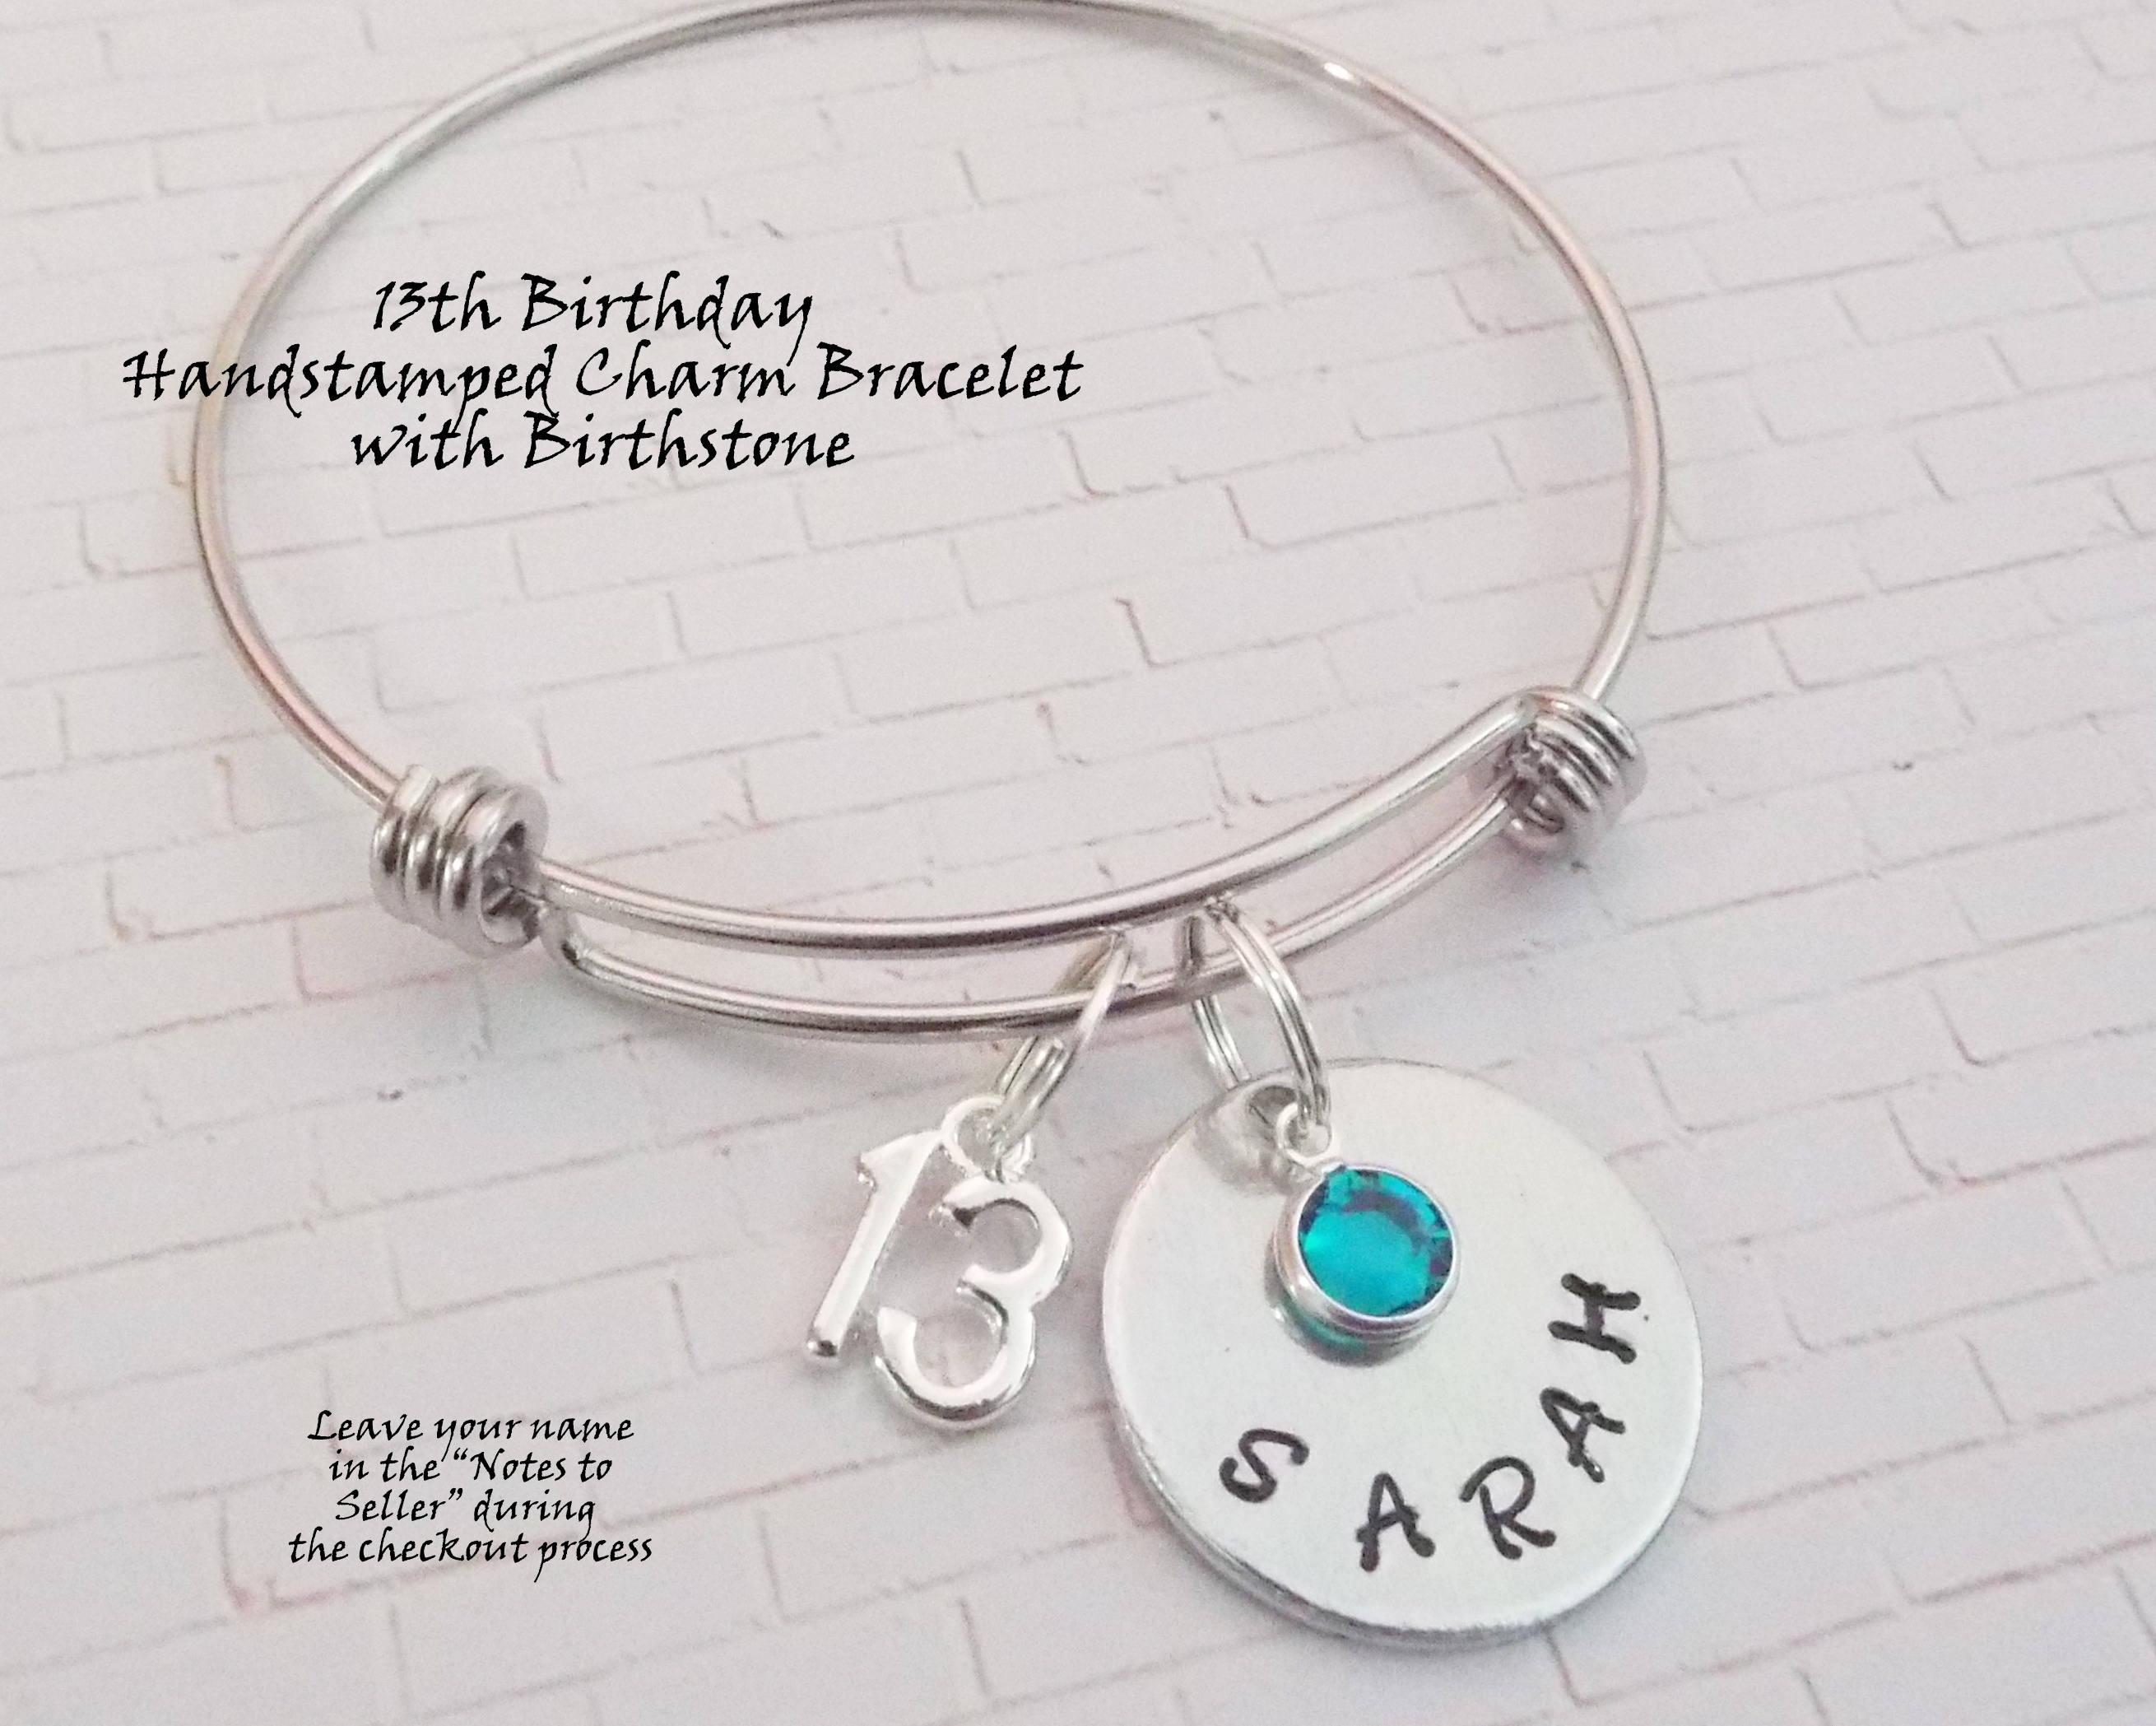 13th Birthday Gift Girl Charm Bracelet Personalized Girls Birthstone For